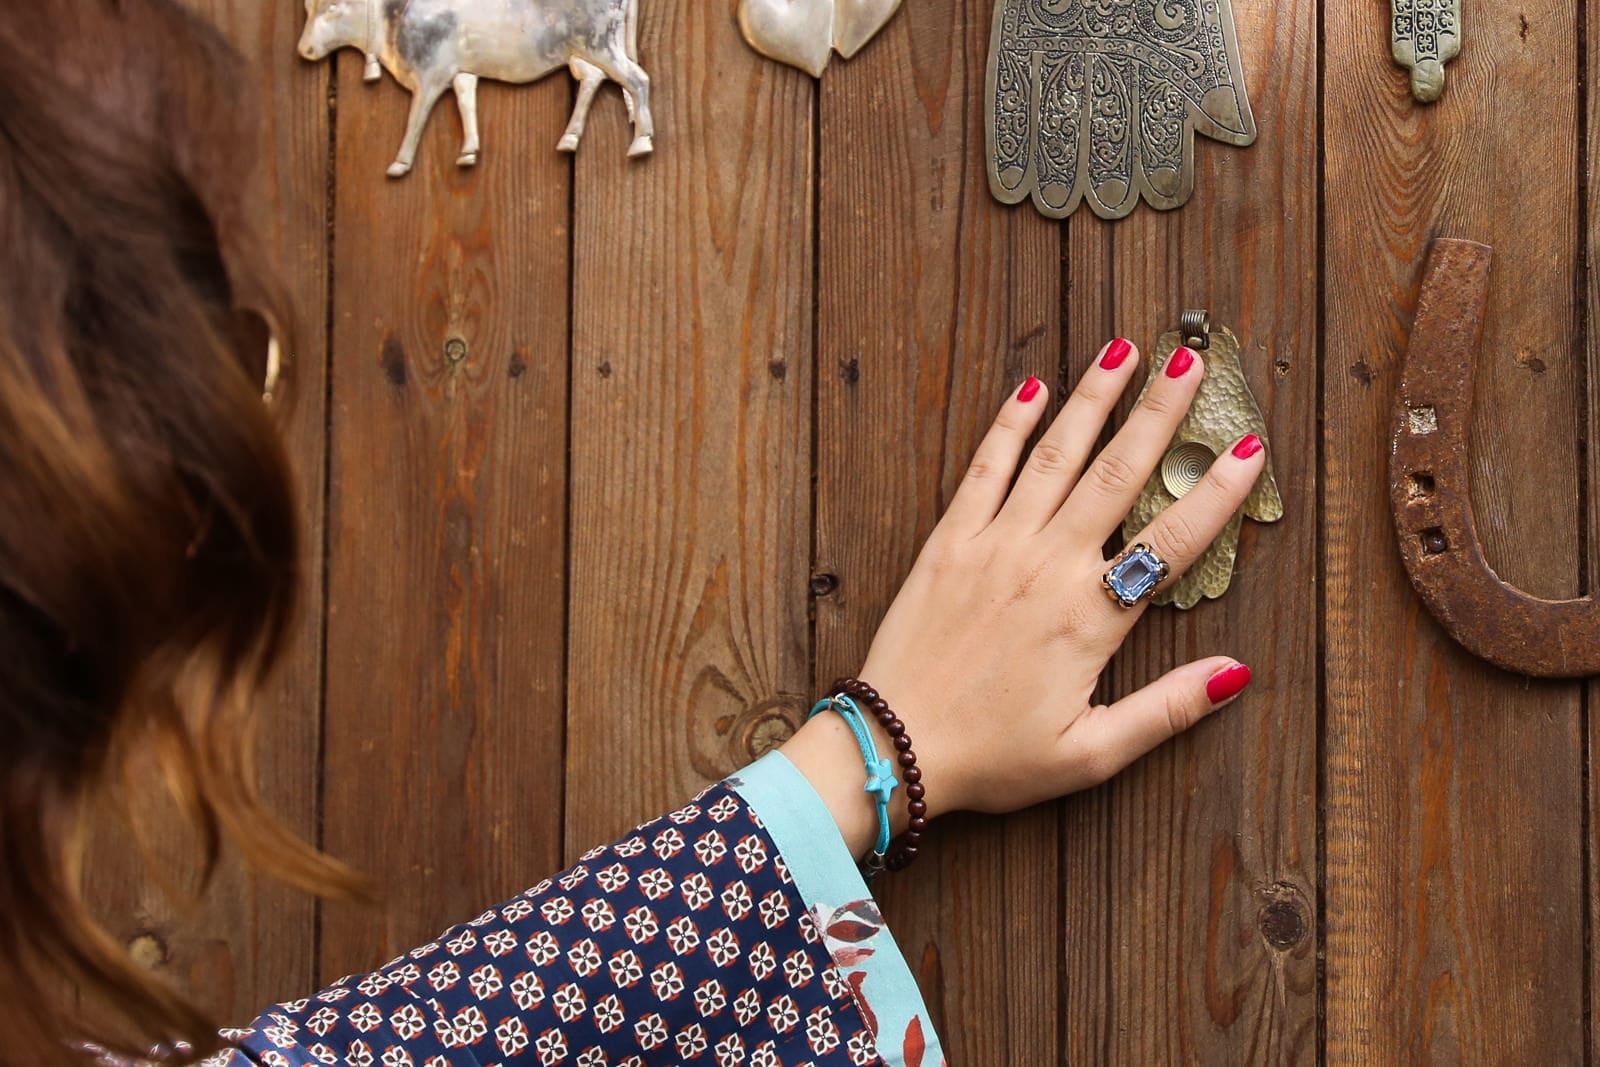 ausflug-zum-anima-garden-marrakesch-marlene-hose- wickelsandale-tunika-fashion-blog-des-belles-choses 1